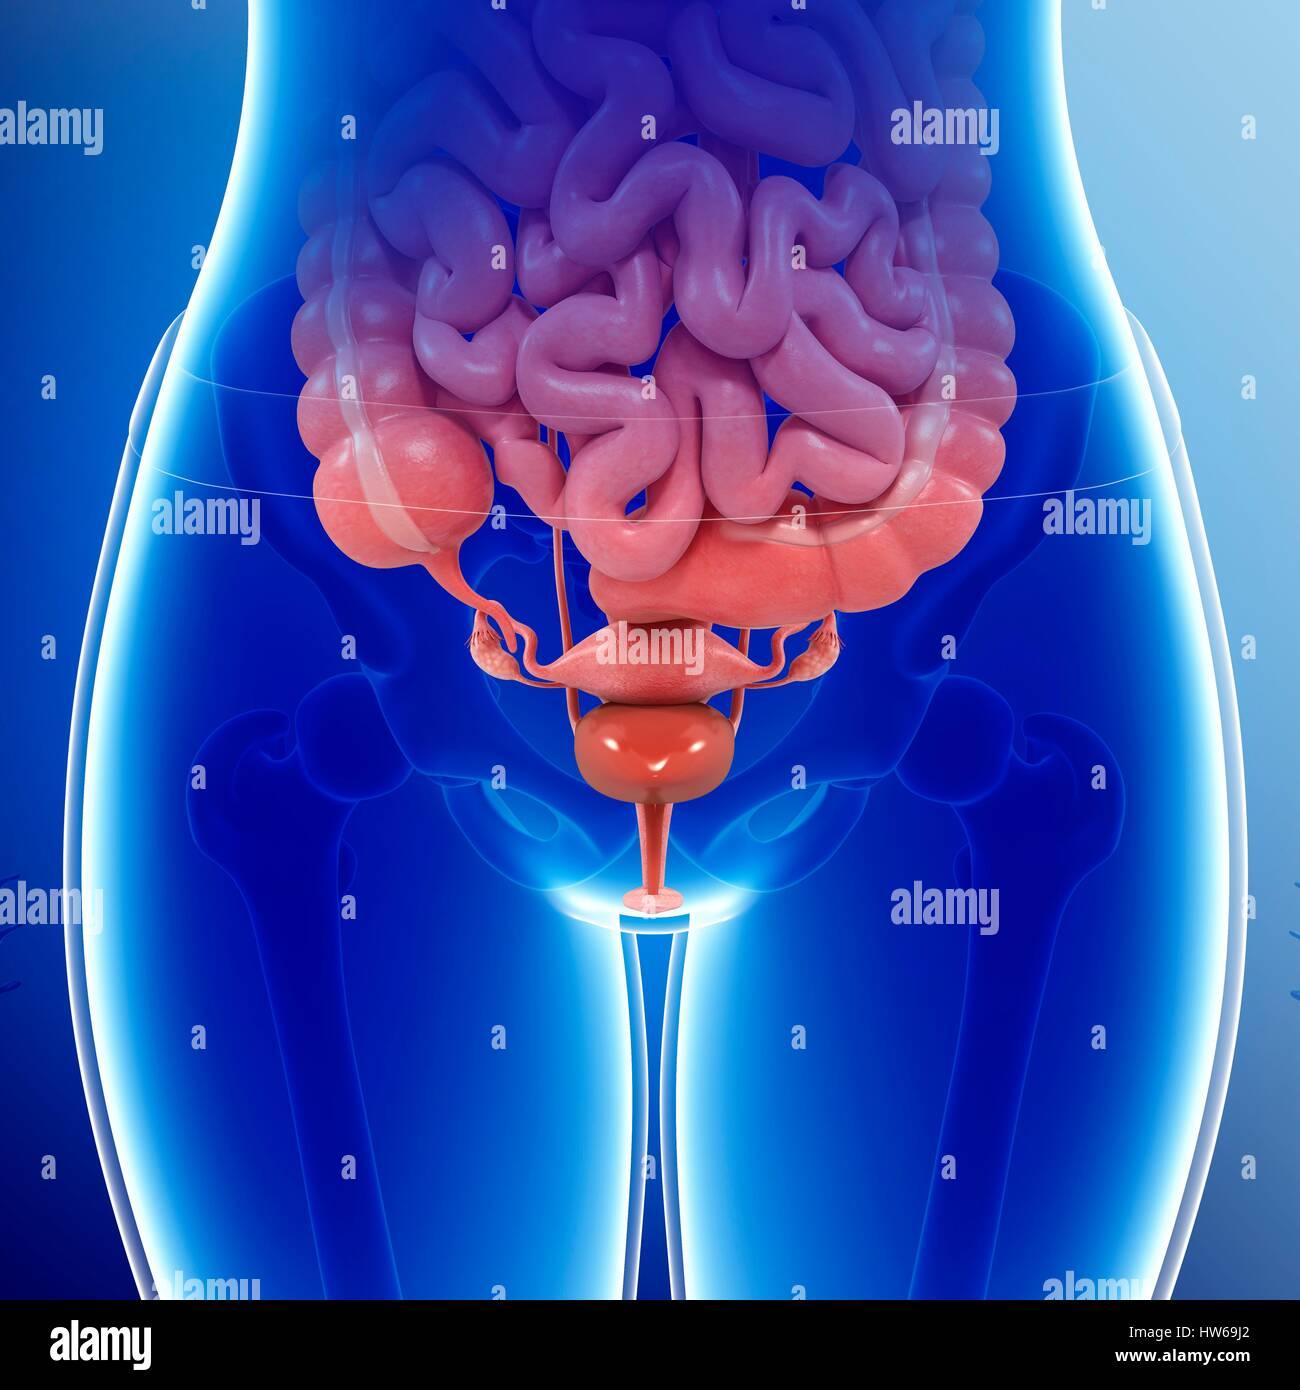 Pelvic Organs Stock Photos & Pelvic Organs Stock Images - Alamy